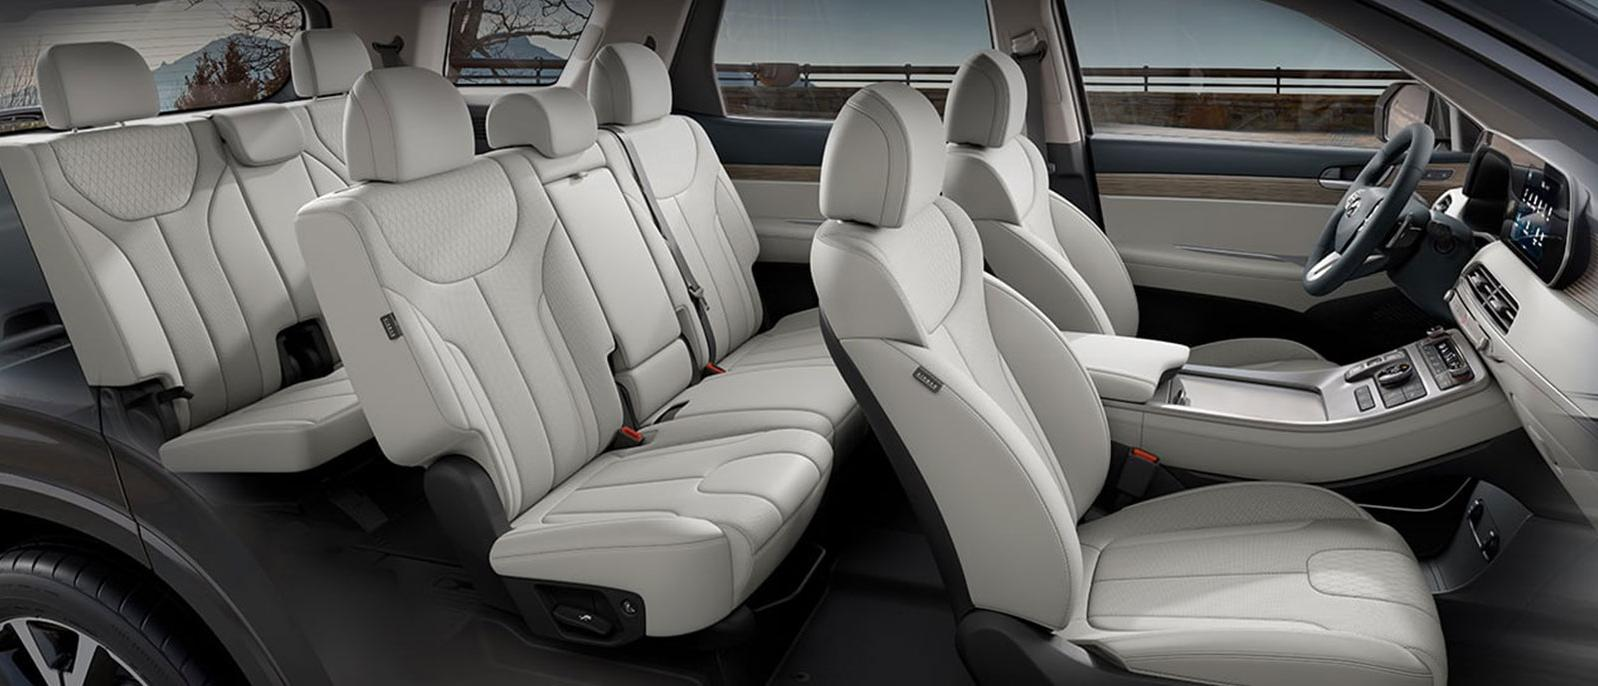 interior of 8-passenger 2020 Hyundai Palisade